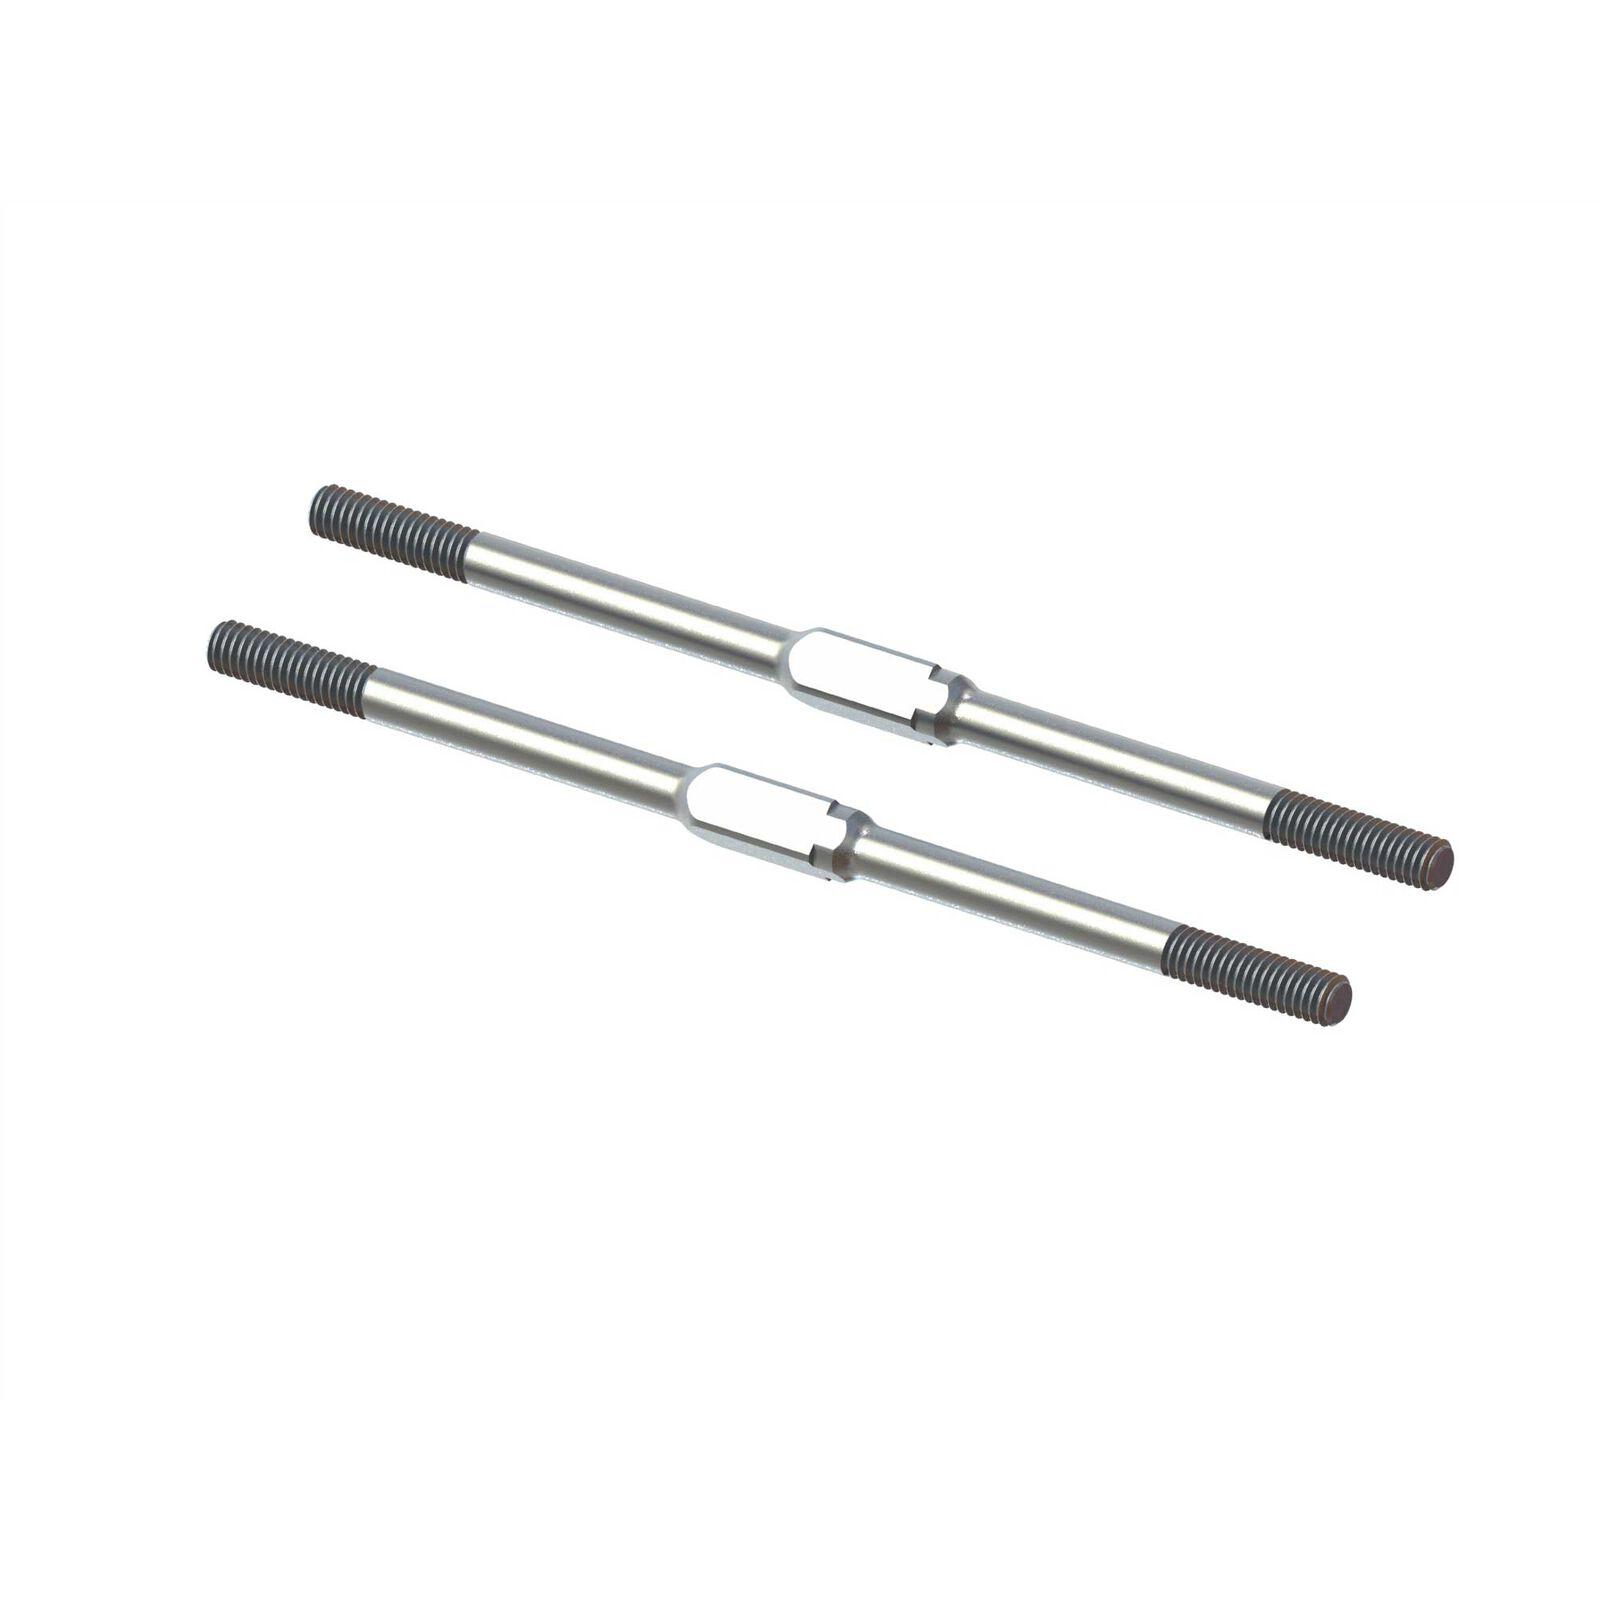 Steel Turnbuckle, M4x95mm Silver (2): EXB